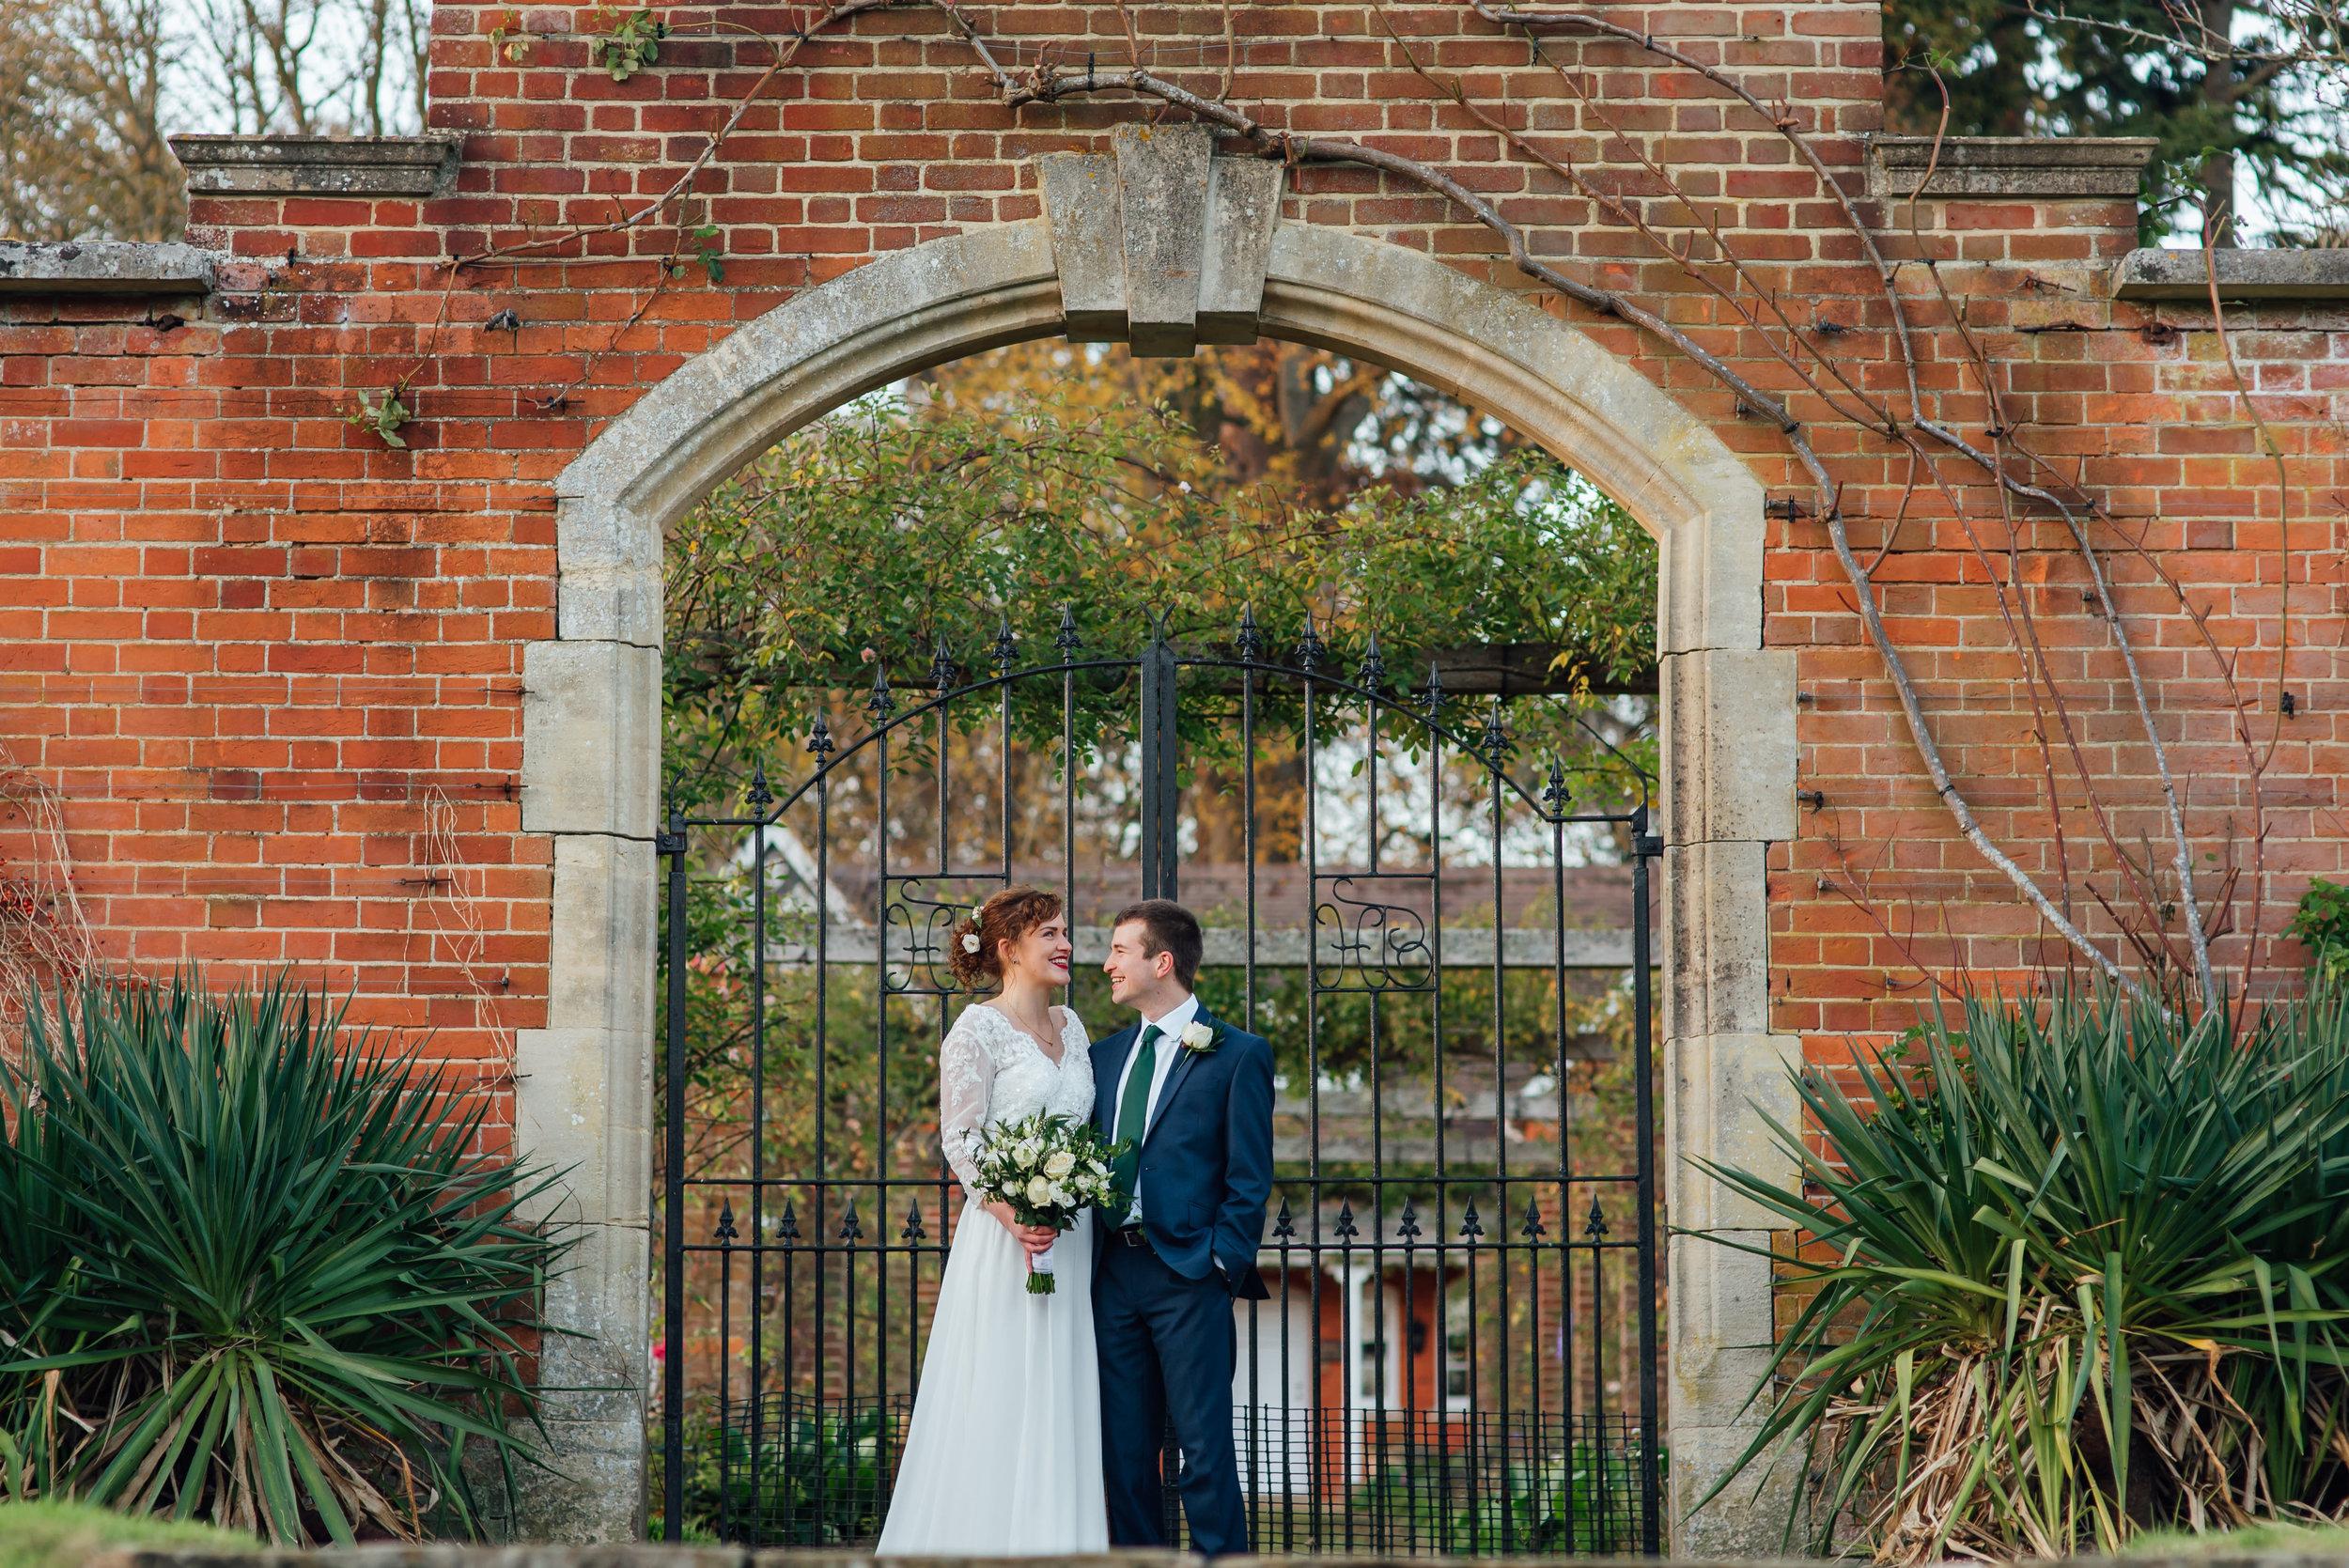 Hampshire-wedding-photographer-hampshire : Amy-James-Photography : Tylney-Hall-Wedding : Tyleny-Hall-Wedding-Photographer : Hampshire-wedding-venue : Fleet-wedding-photographer-farnborough-527.jpg